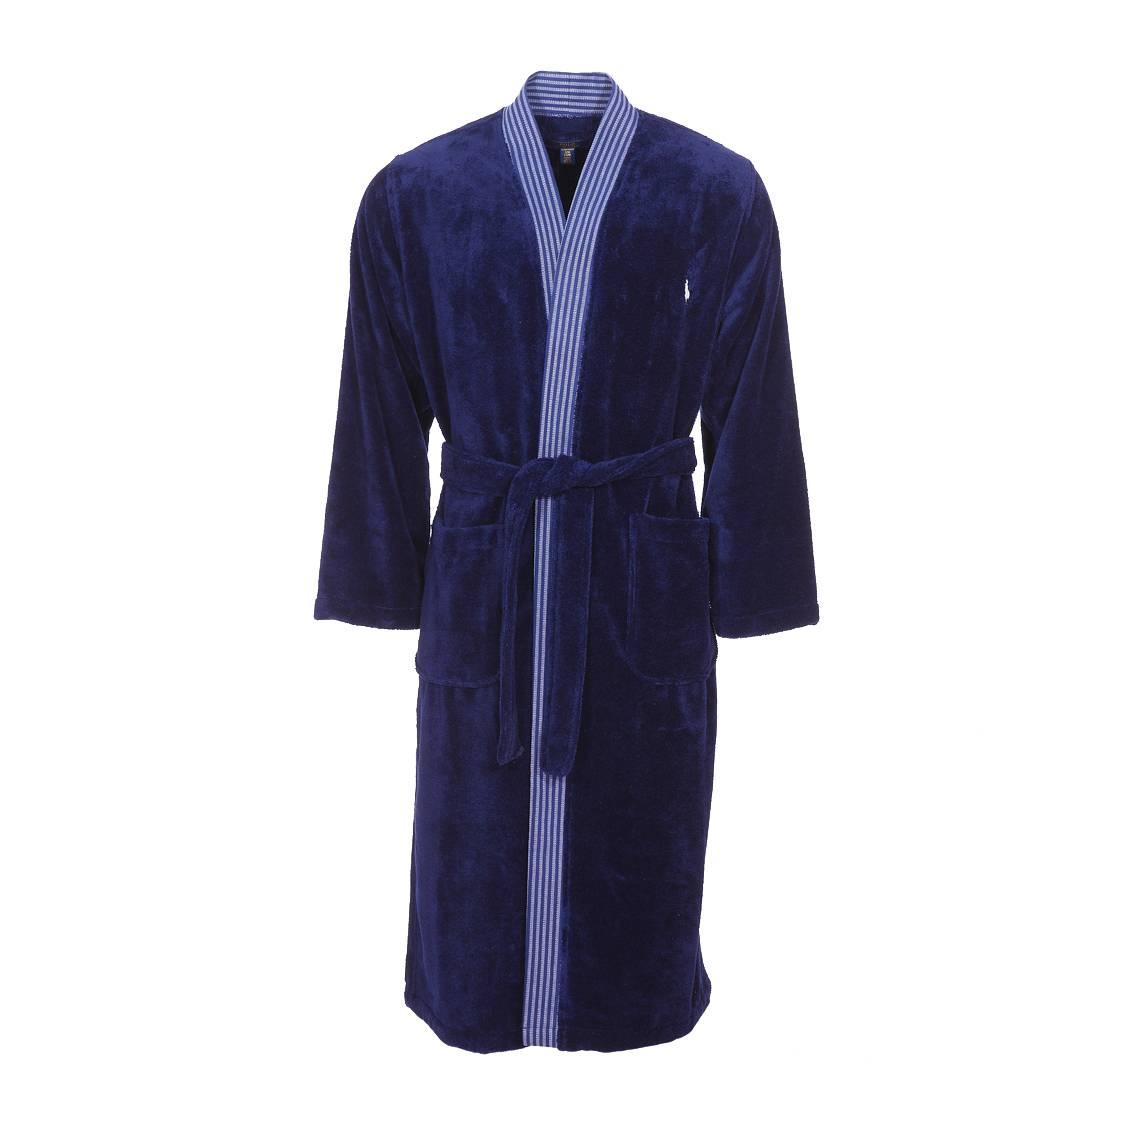 Kimono de bain  en éponge de coton bleu marine